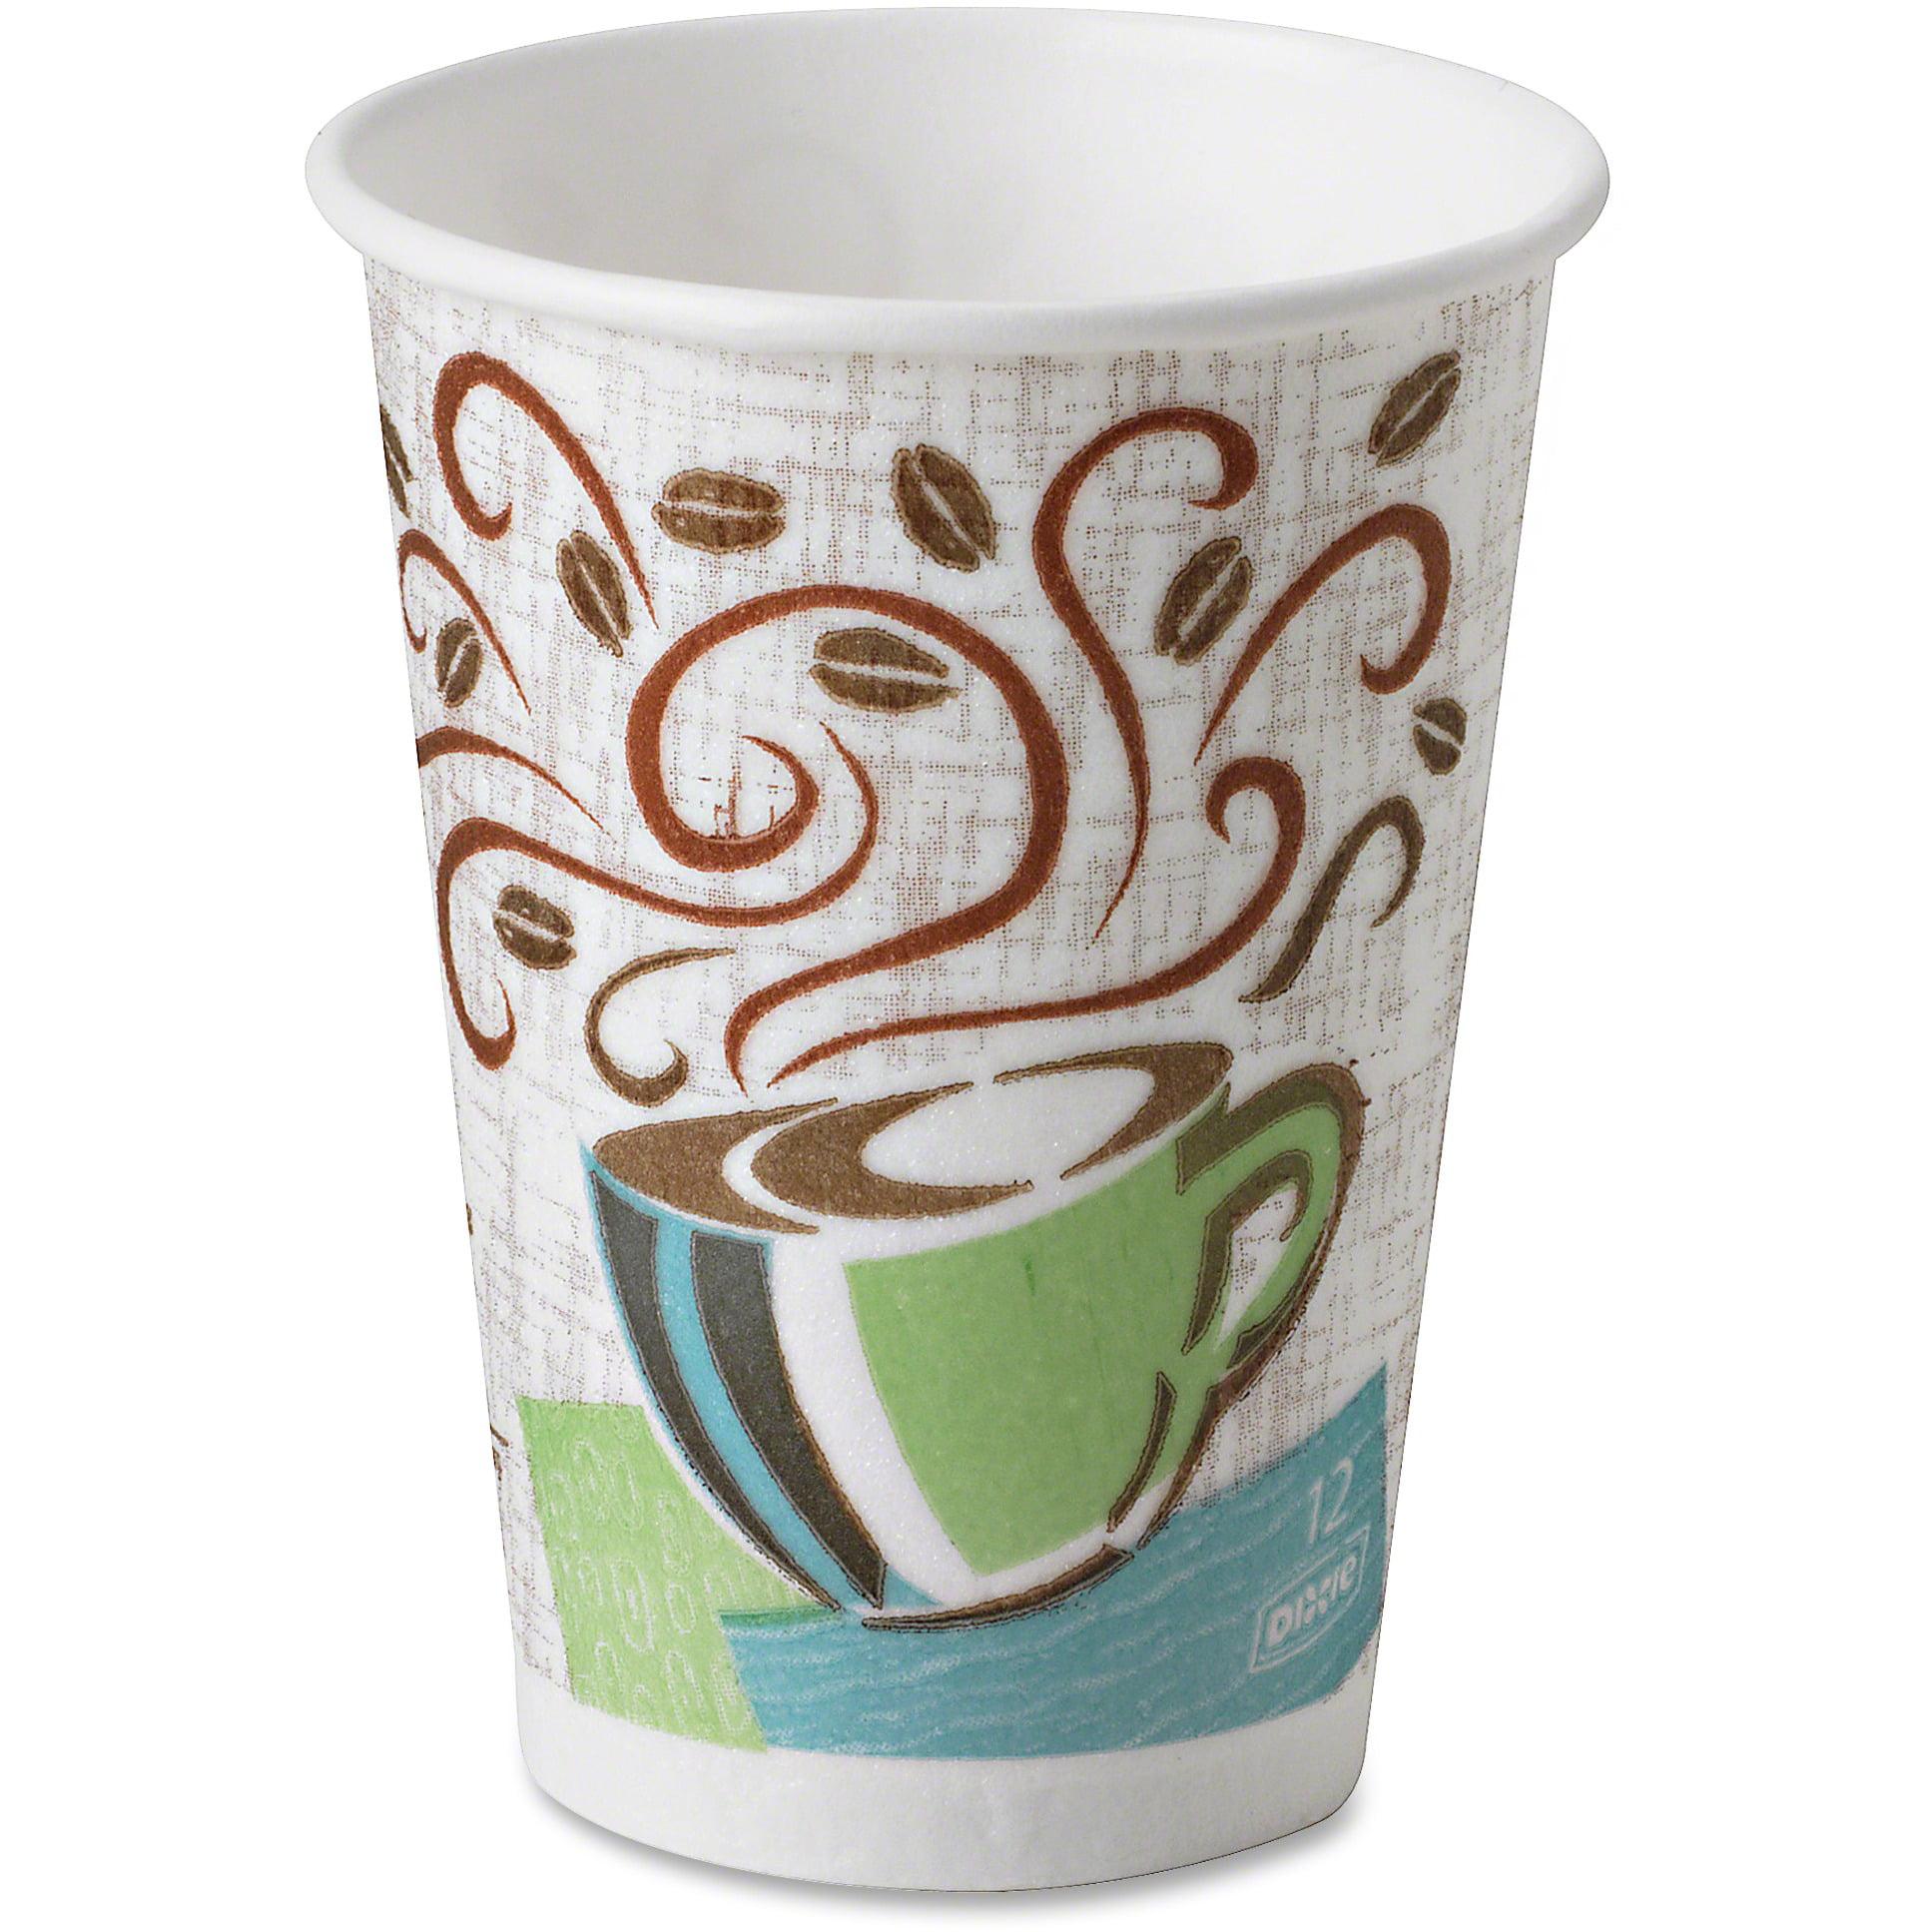 Dixie, DXE5342CDSBP, PerfecTouch Coffee Haze Hot Cups, 160 / Pack, Assorted, 12 fl oz